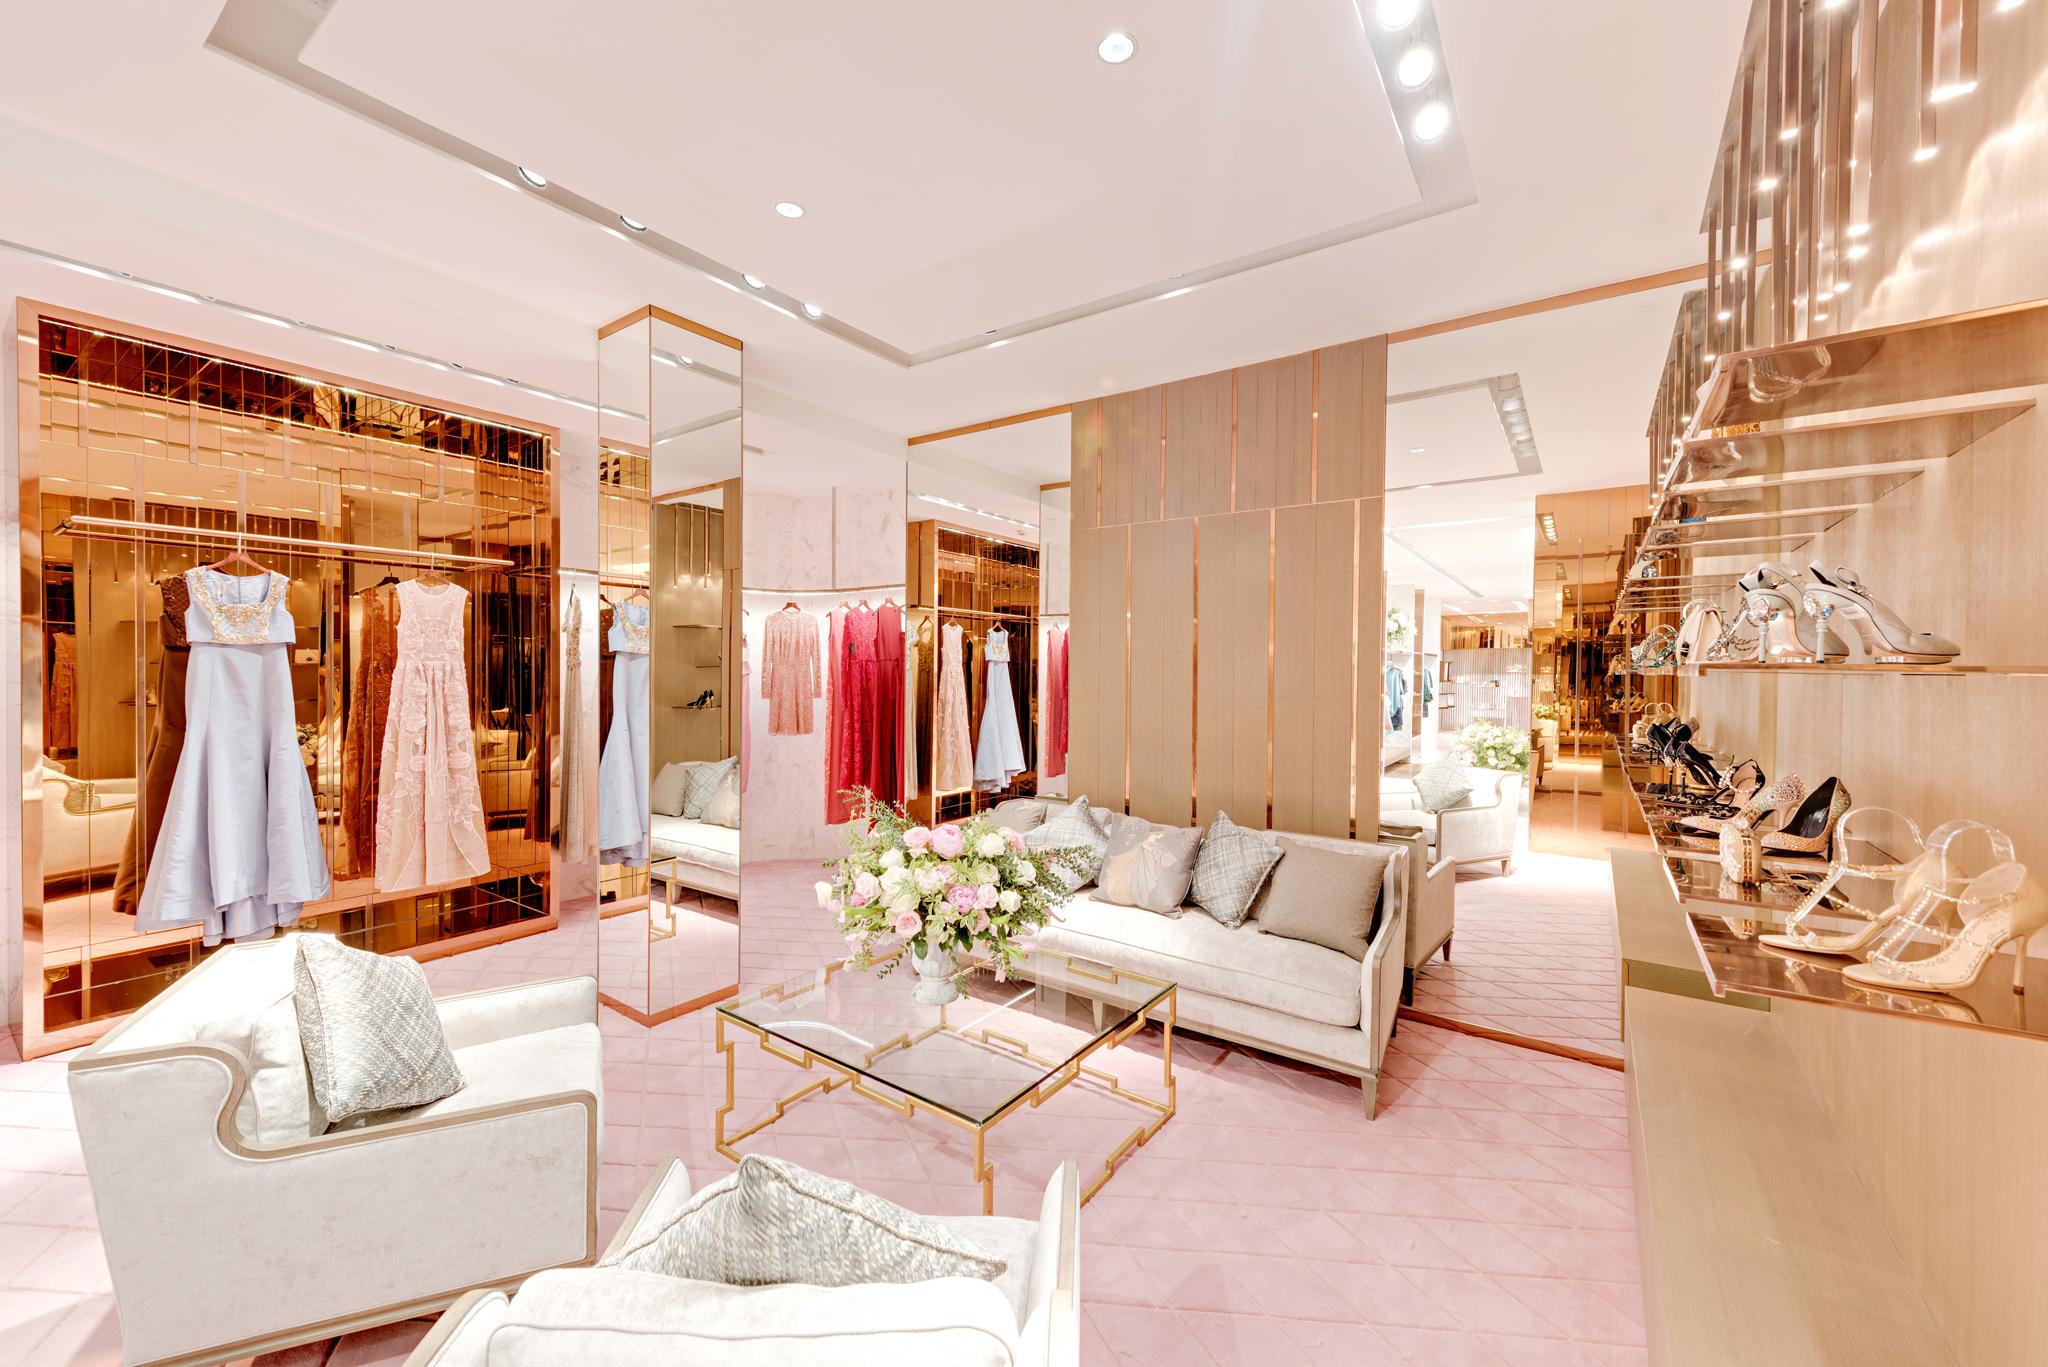 20161224 - Jacqueline - HCM - Commercial - Interior - Store - Retouch 0005.jpg